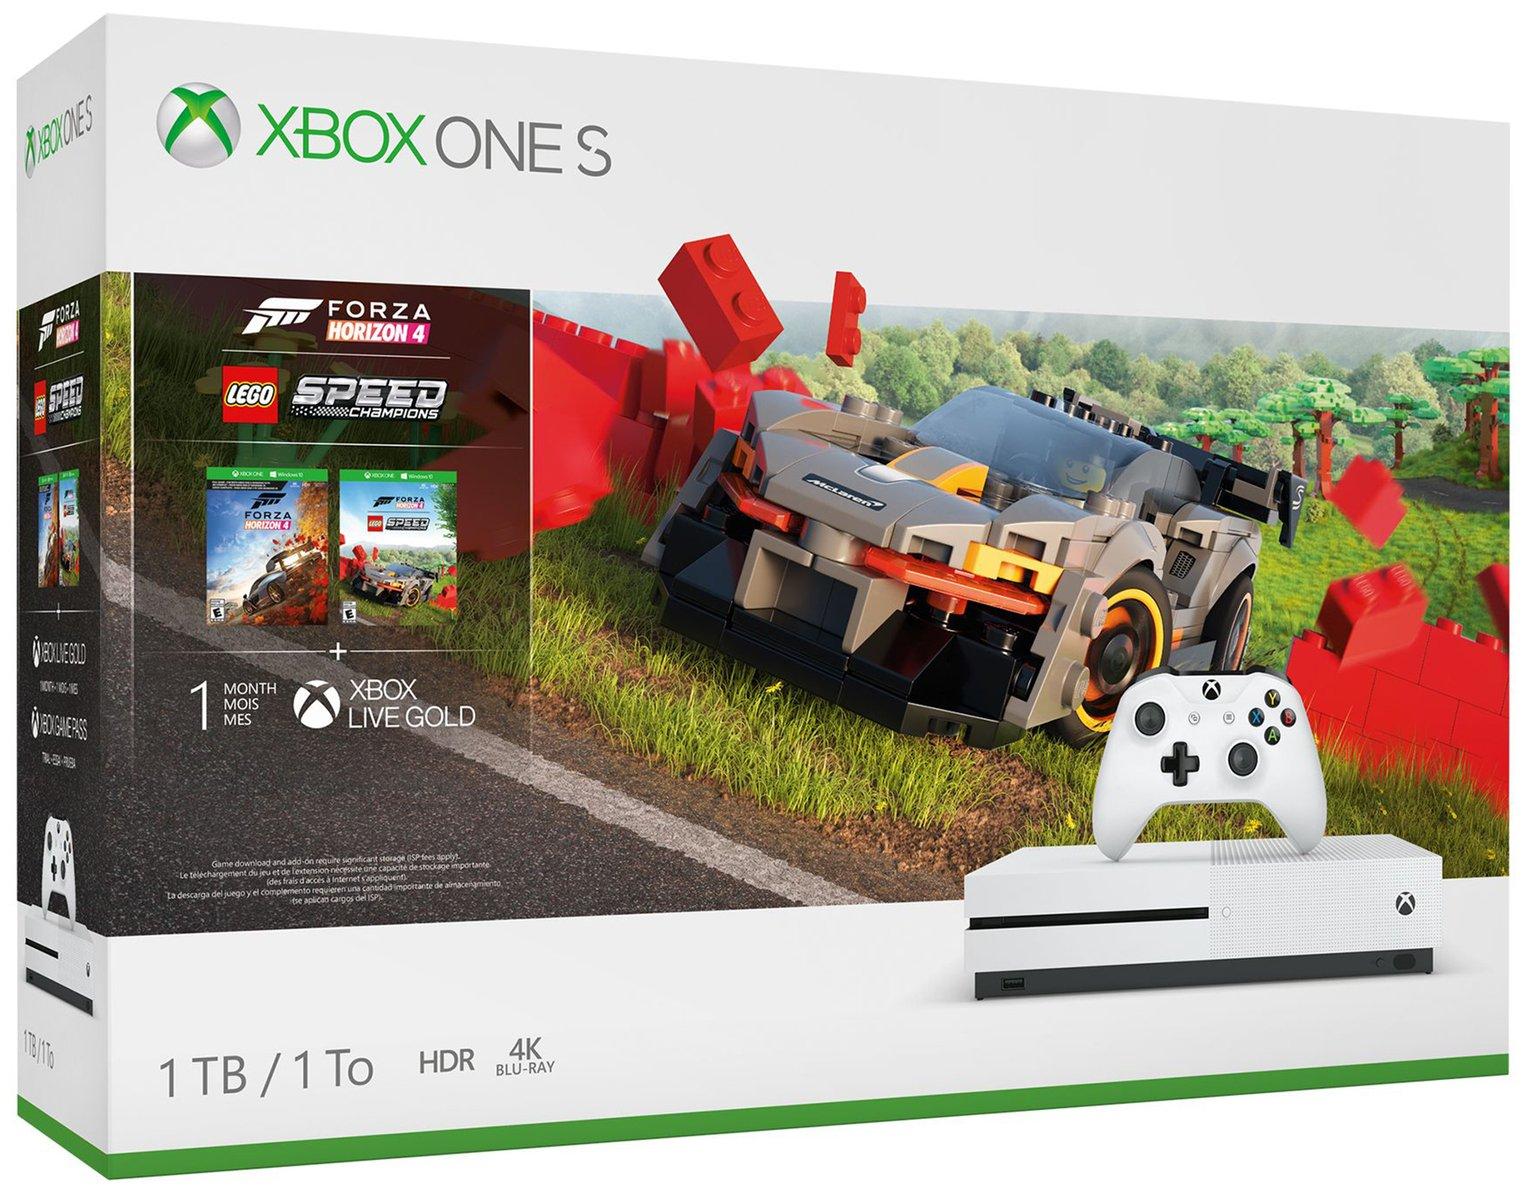 Xbox One S 1TB Console & Forza Horizon 4 LEGO Speed Bundle